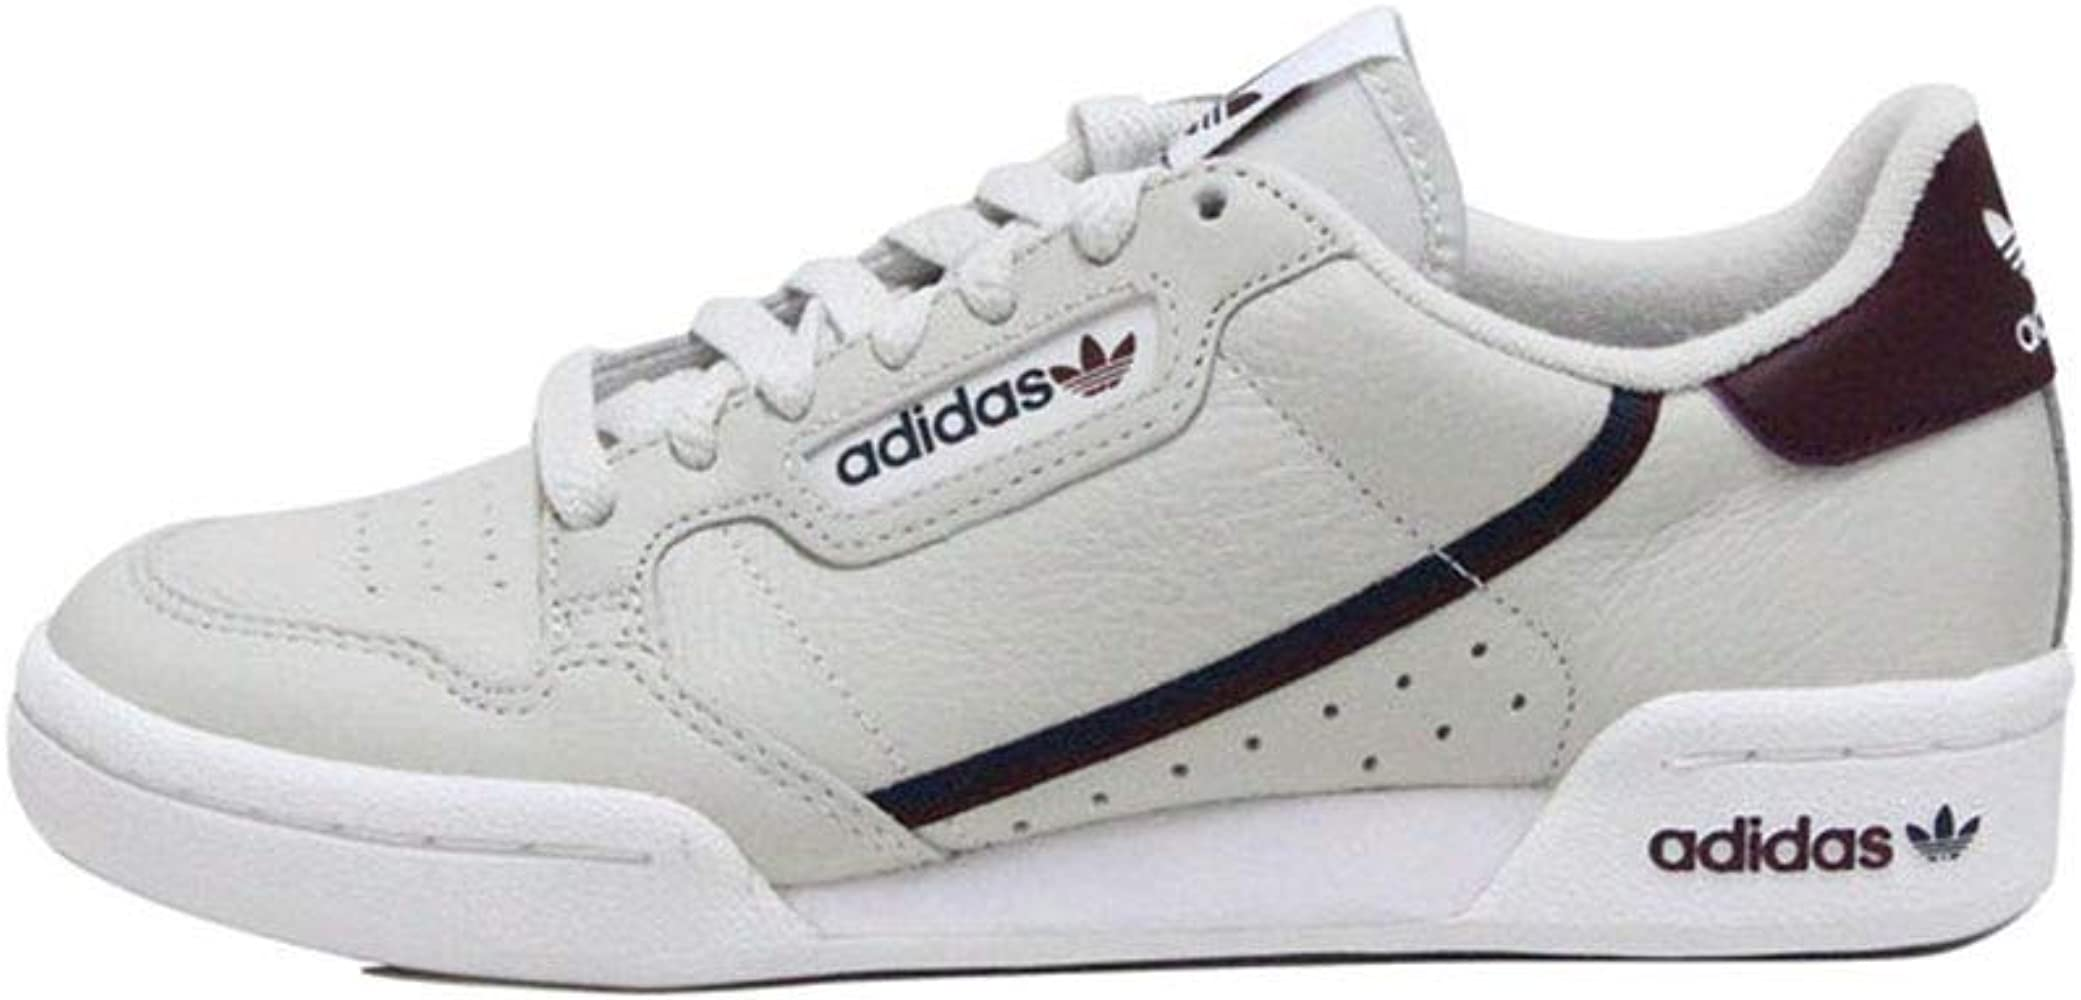 adidas Continental 80 Mens F97413 Size